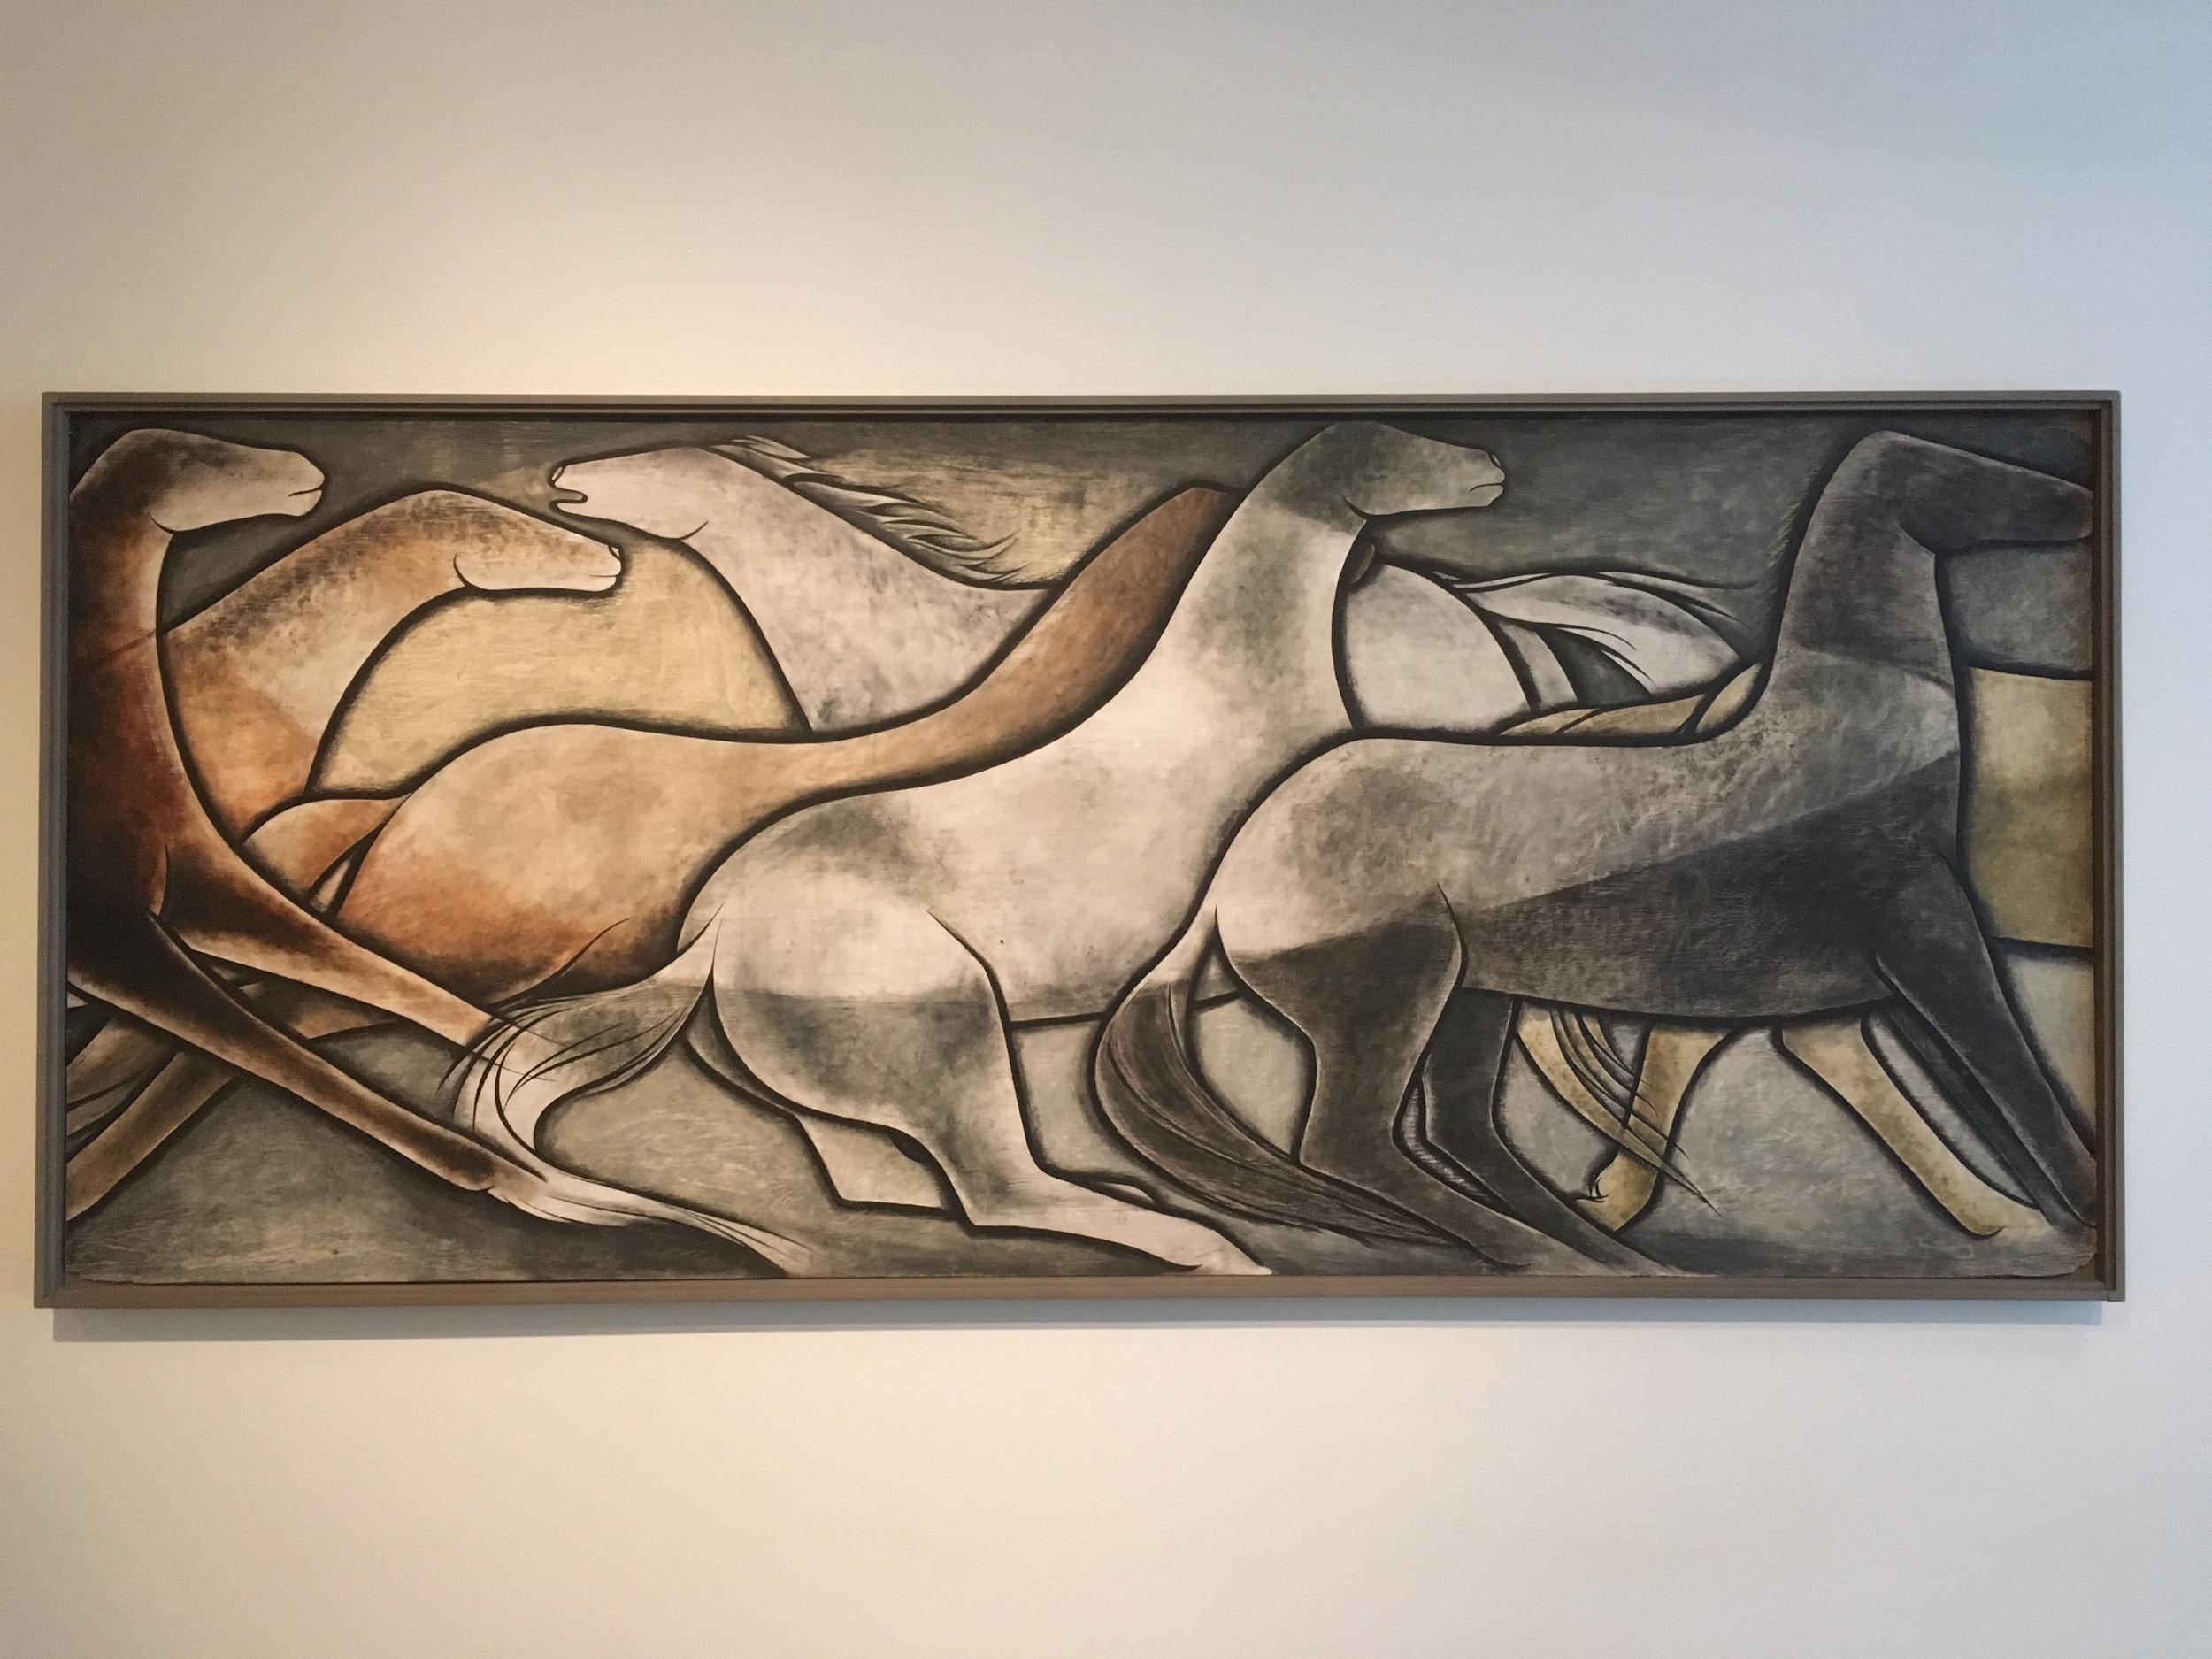 Wild Horses (one panel of six), Frank Mechau, 1936